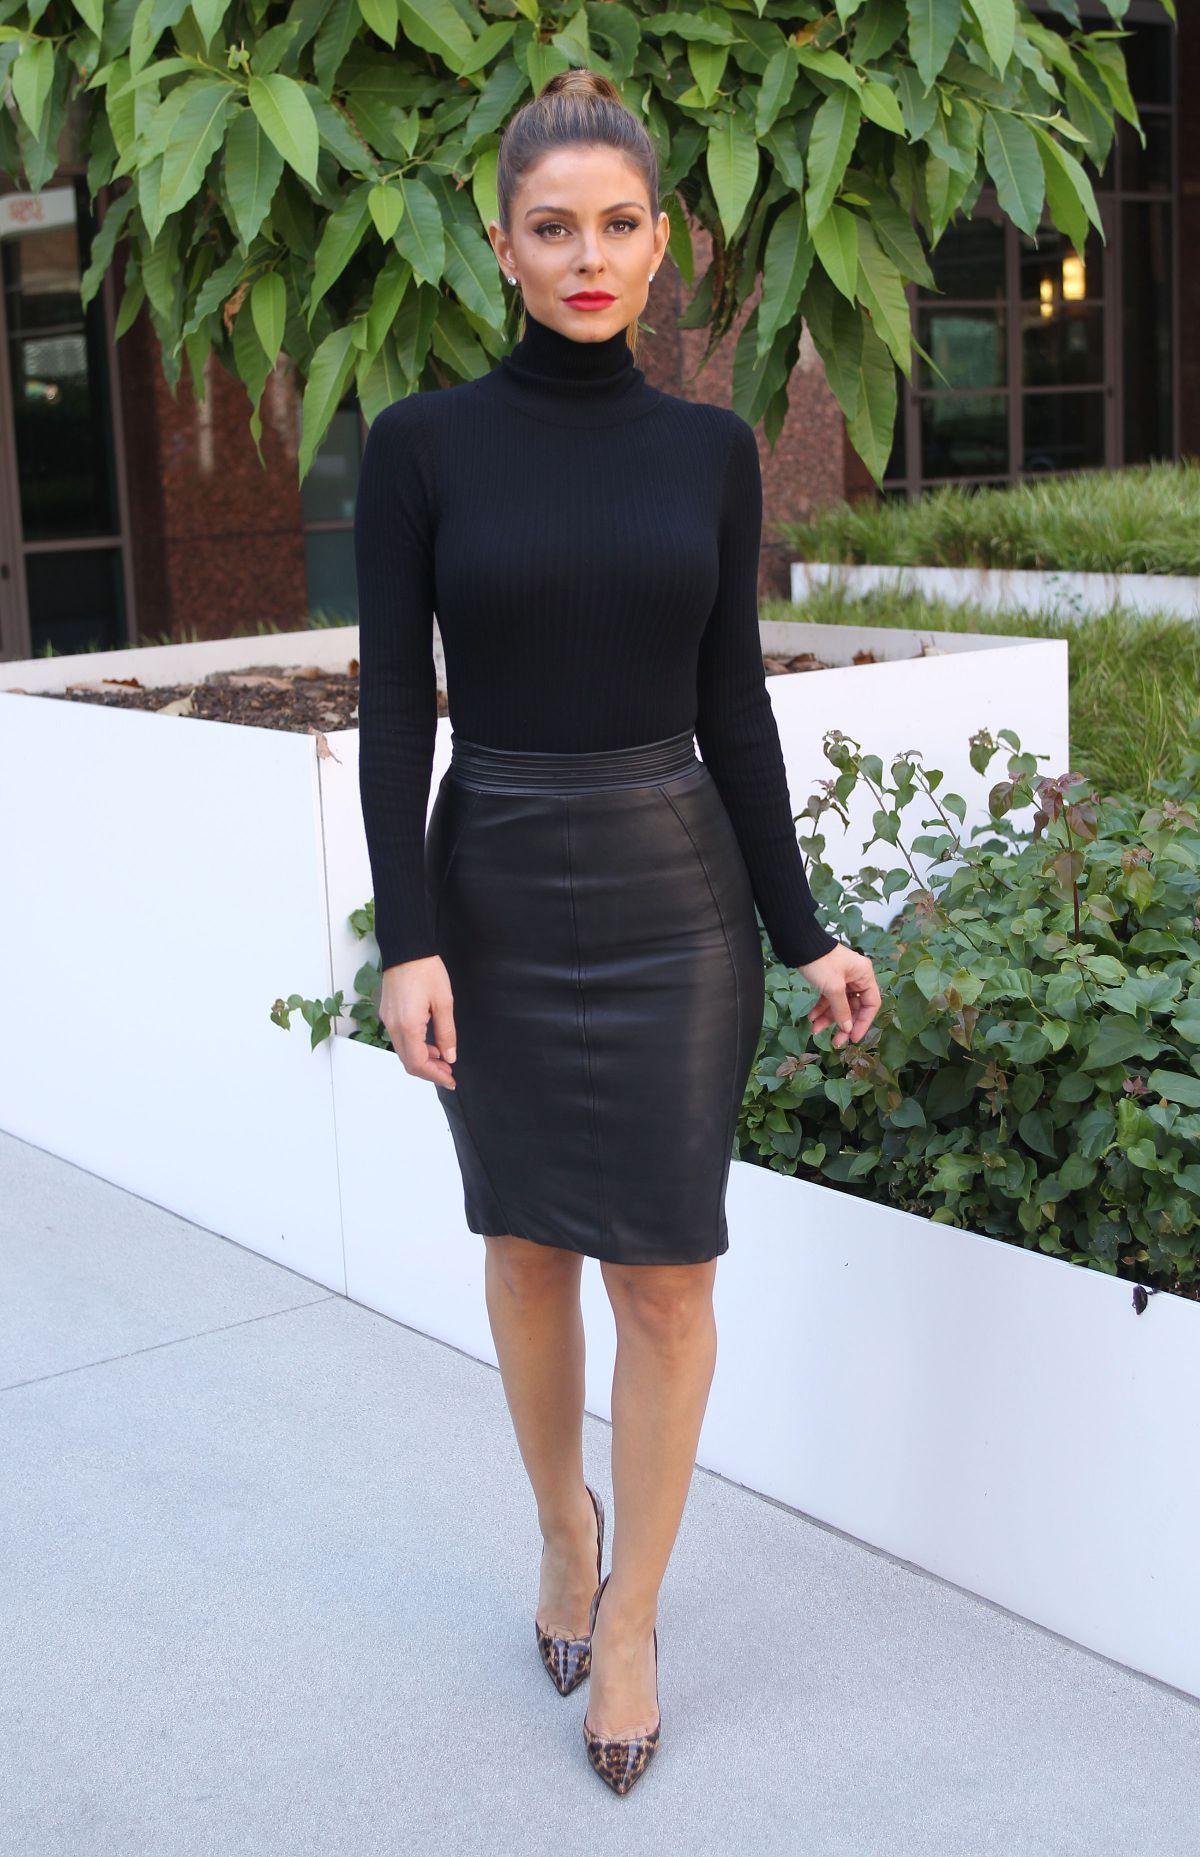 I ️ her tight mini skirt and high heels, she has beautiful ...